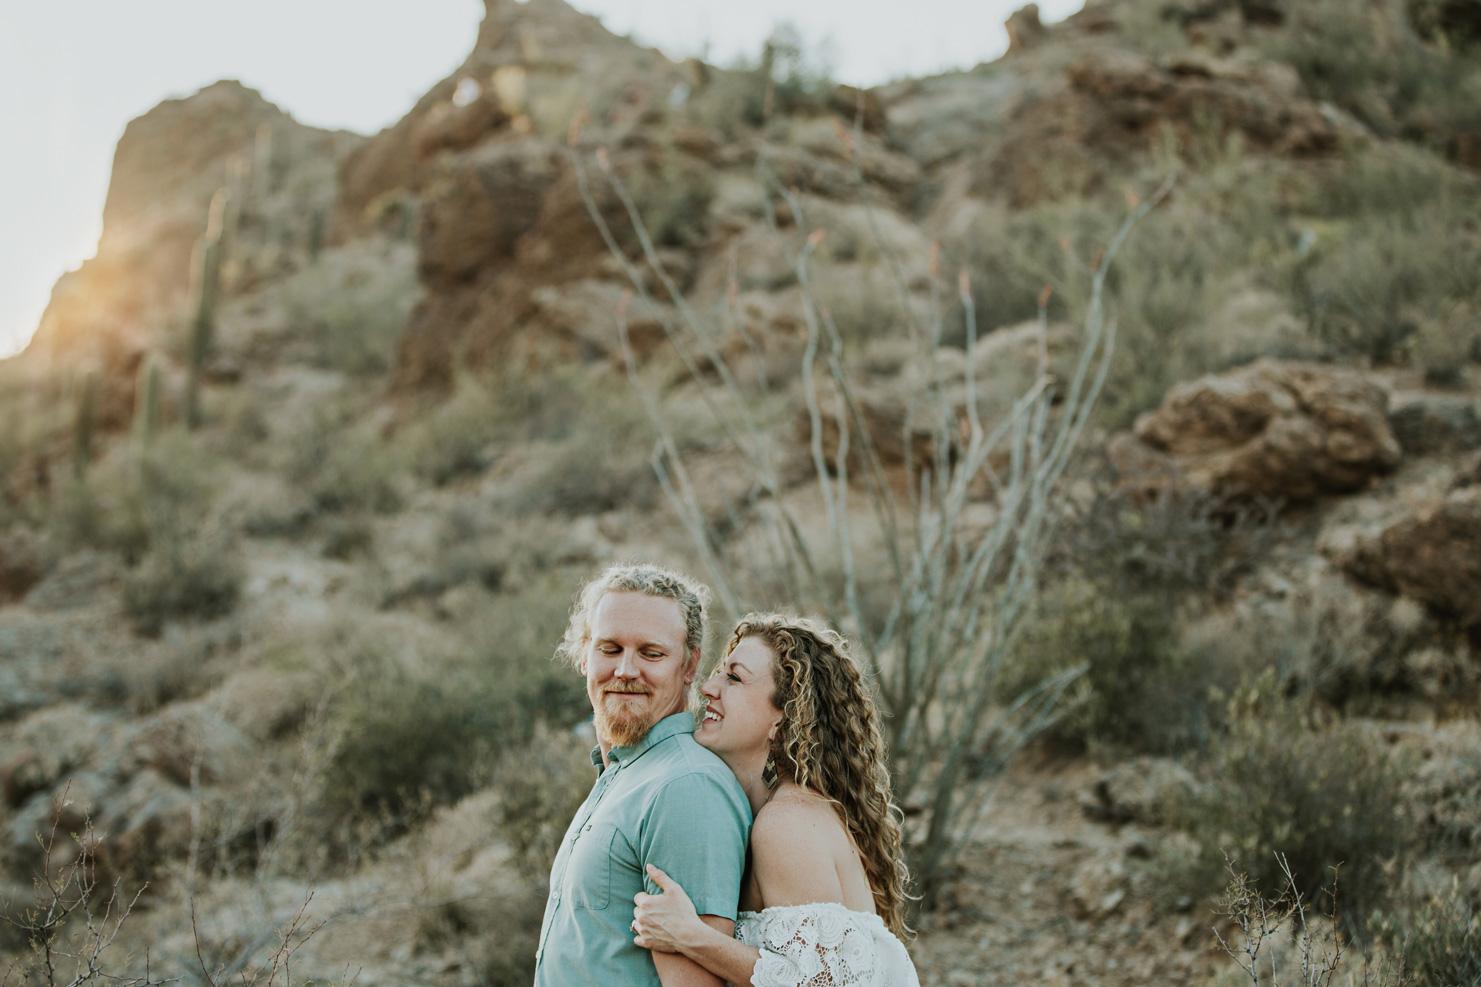 CindyGiovagnoli_Tucson_Arizona_engagement_lifestyle_portrait_Airstream_Excella_travel_trailer_camper_Saguaro_National_Park-031.jpg